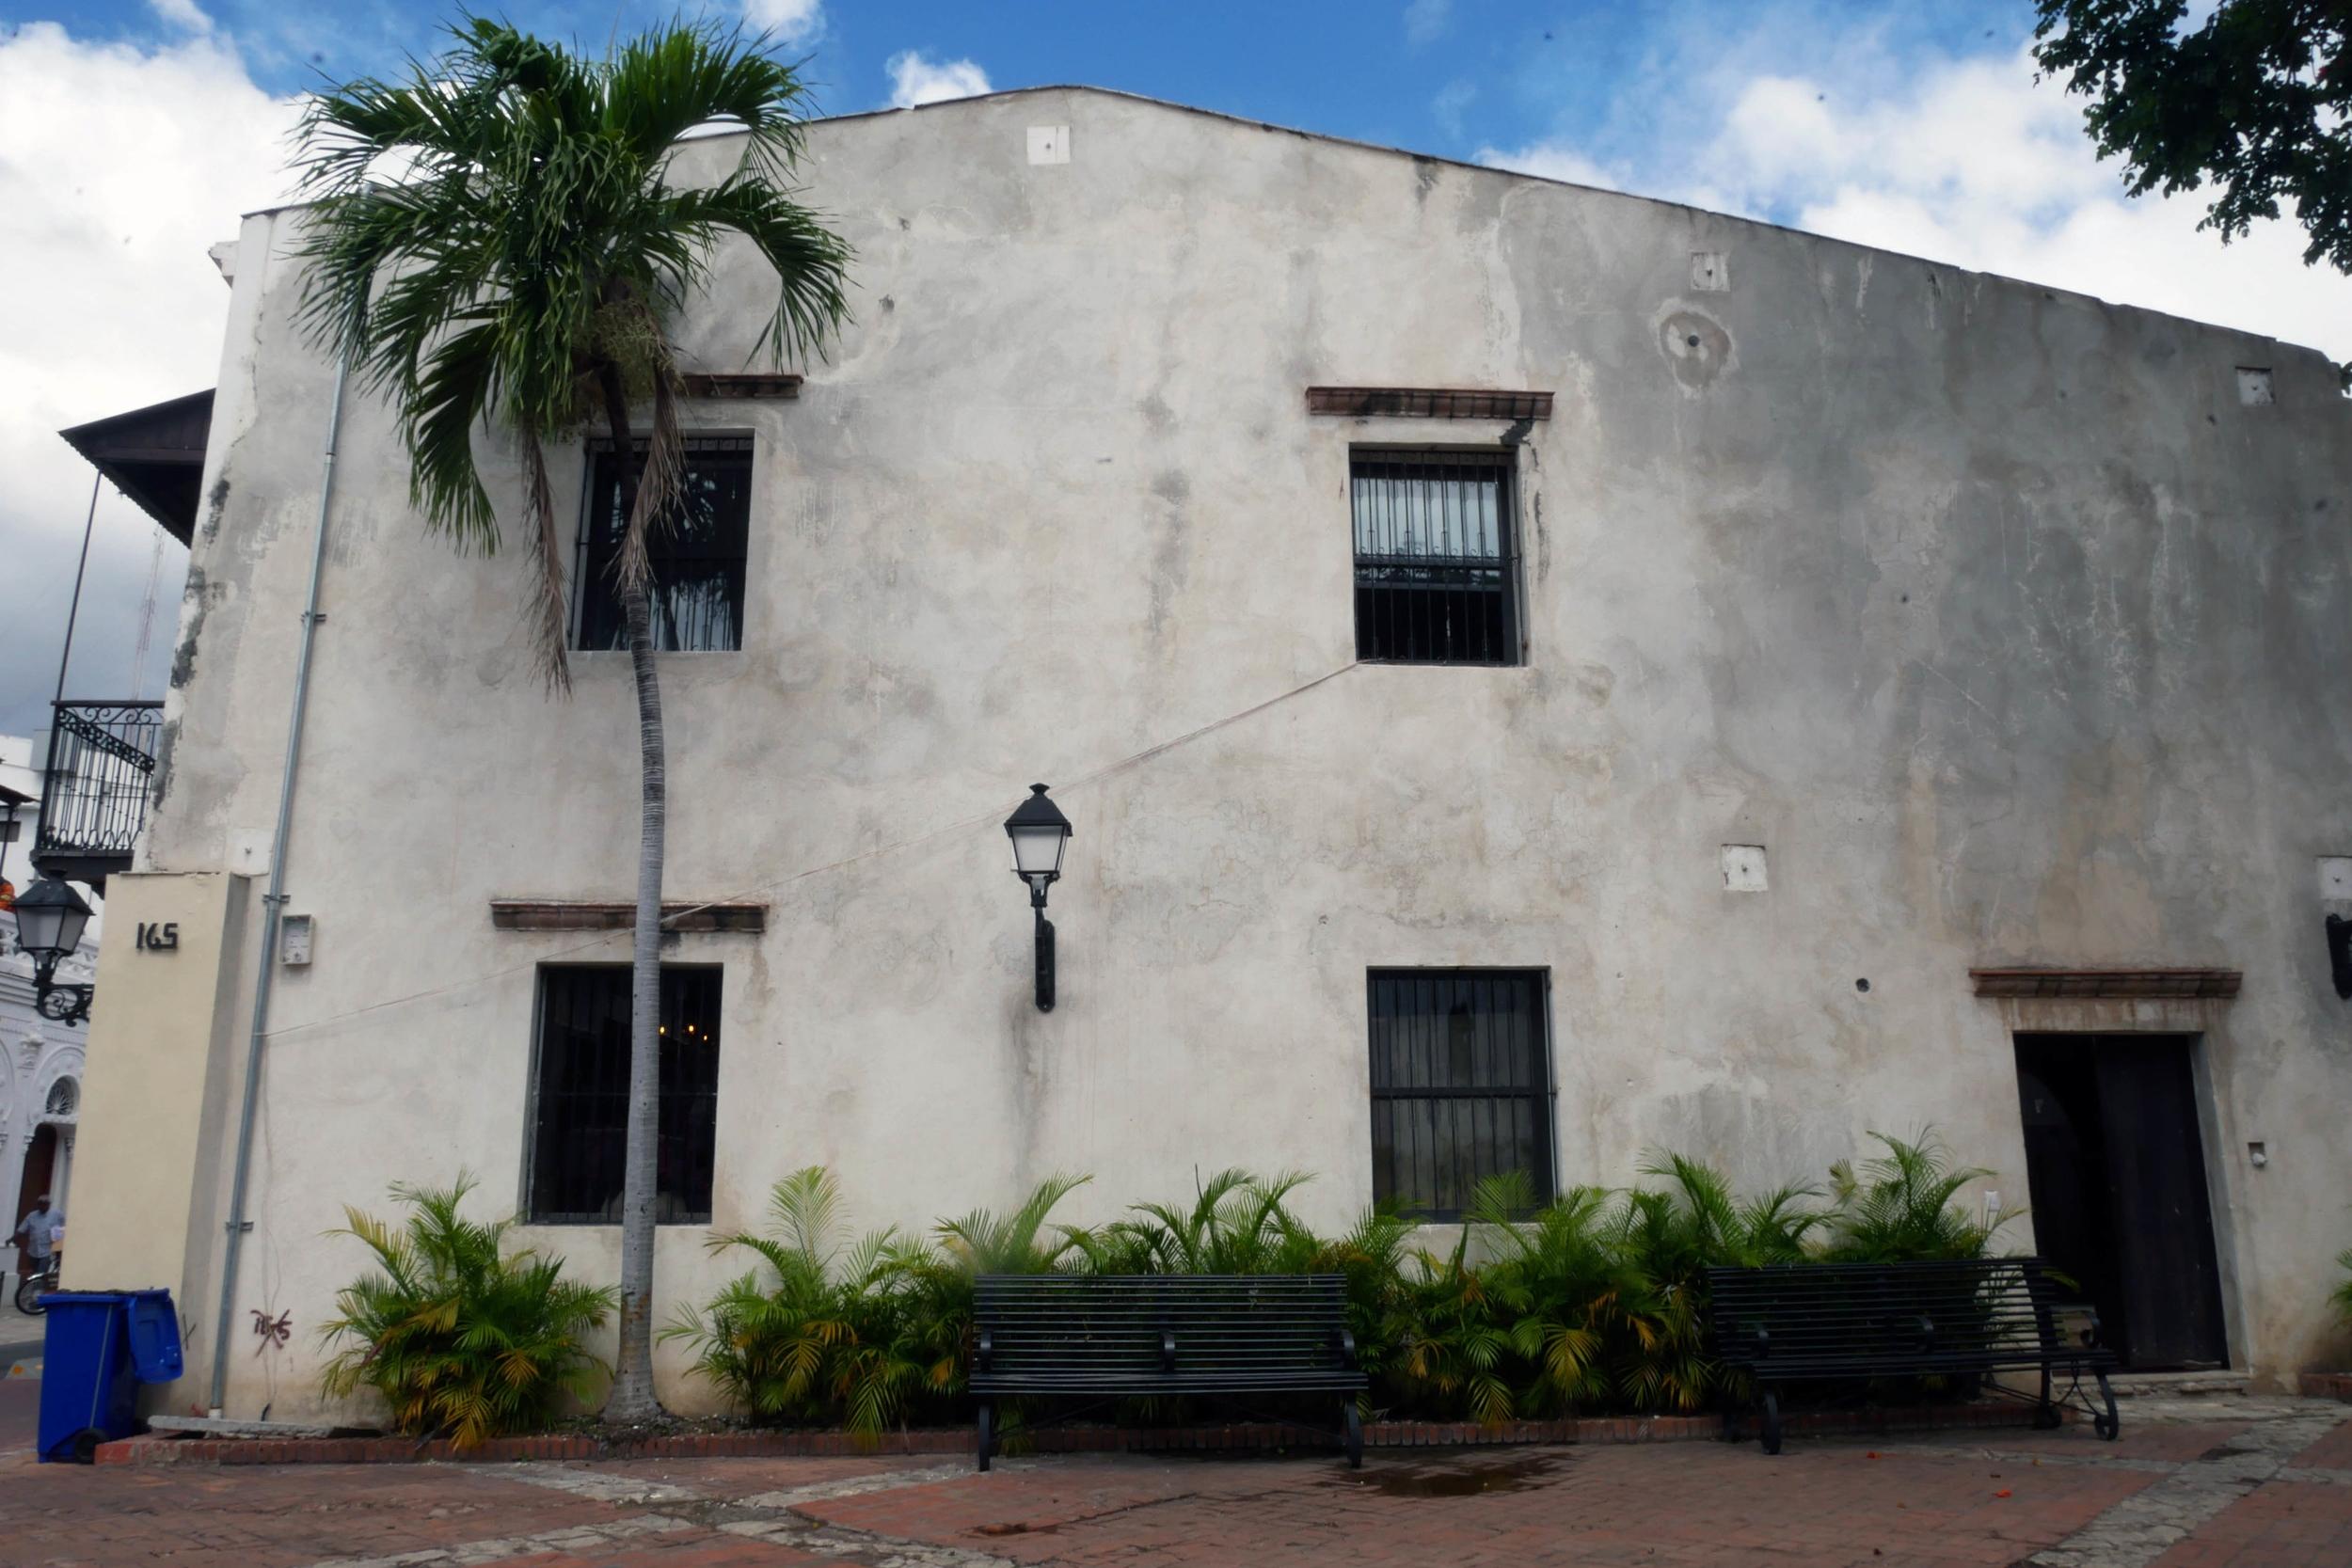 Charming Santo Domingo streets